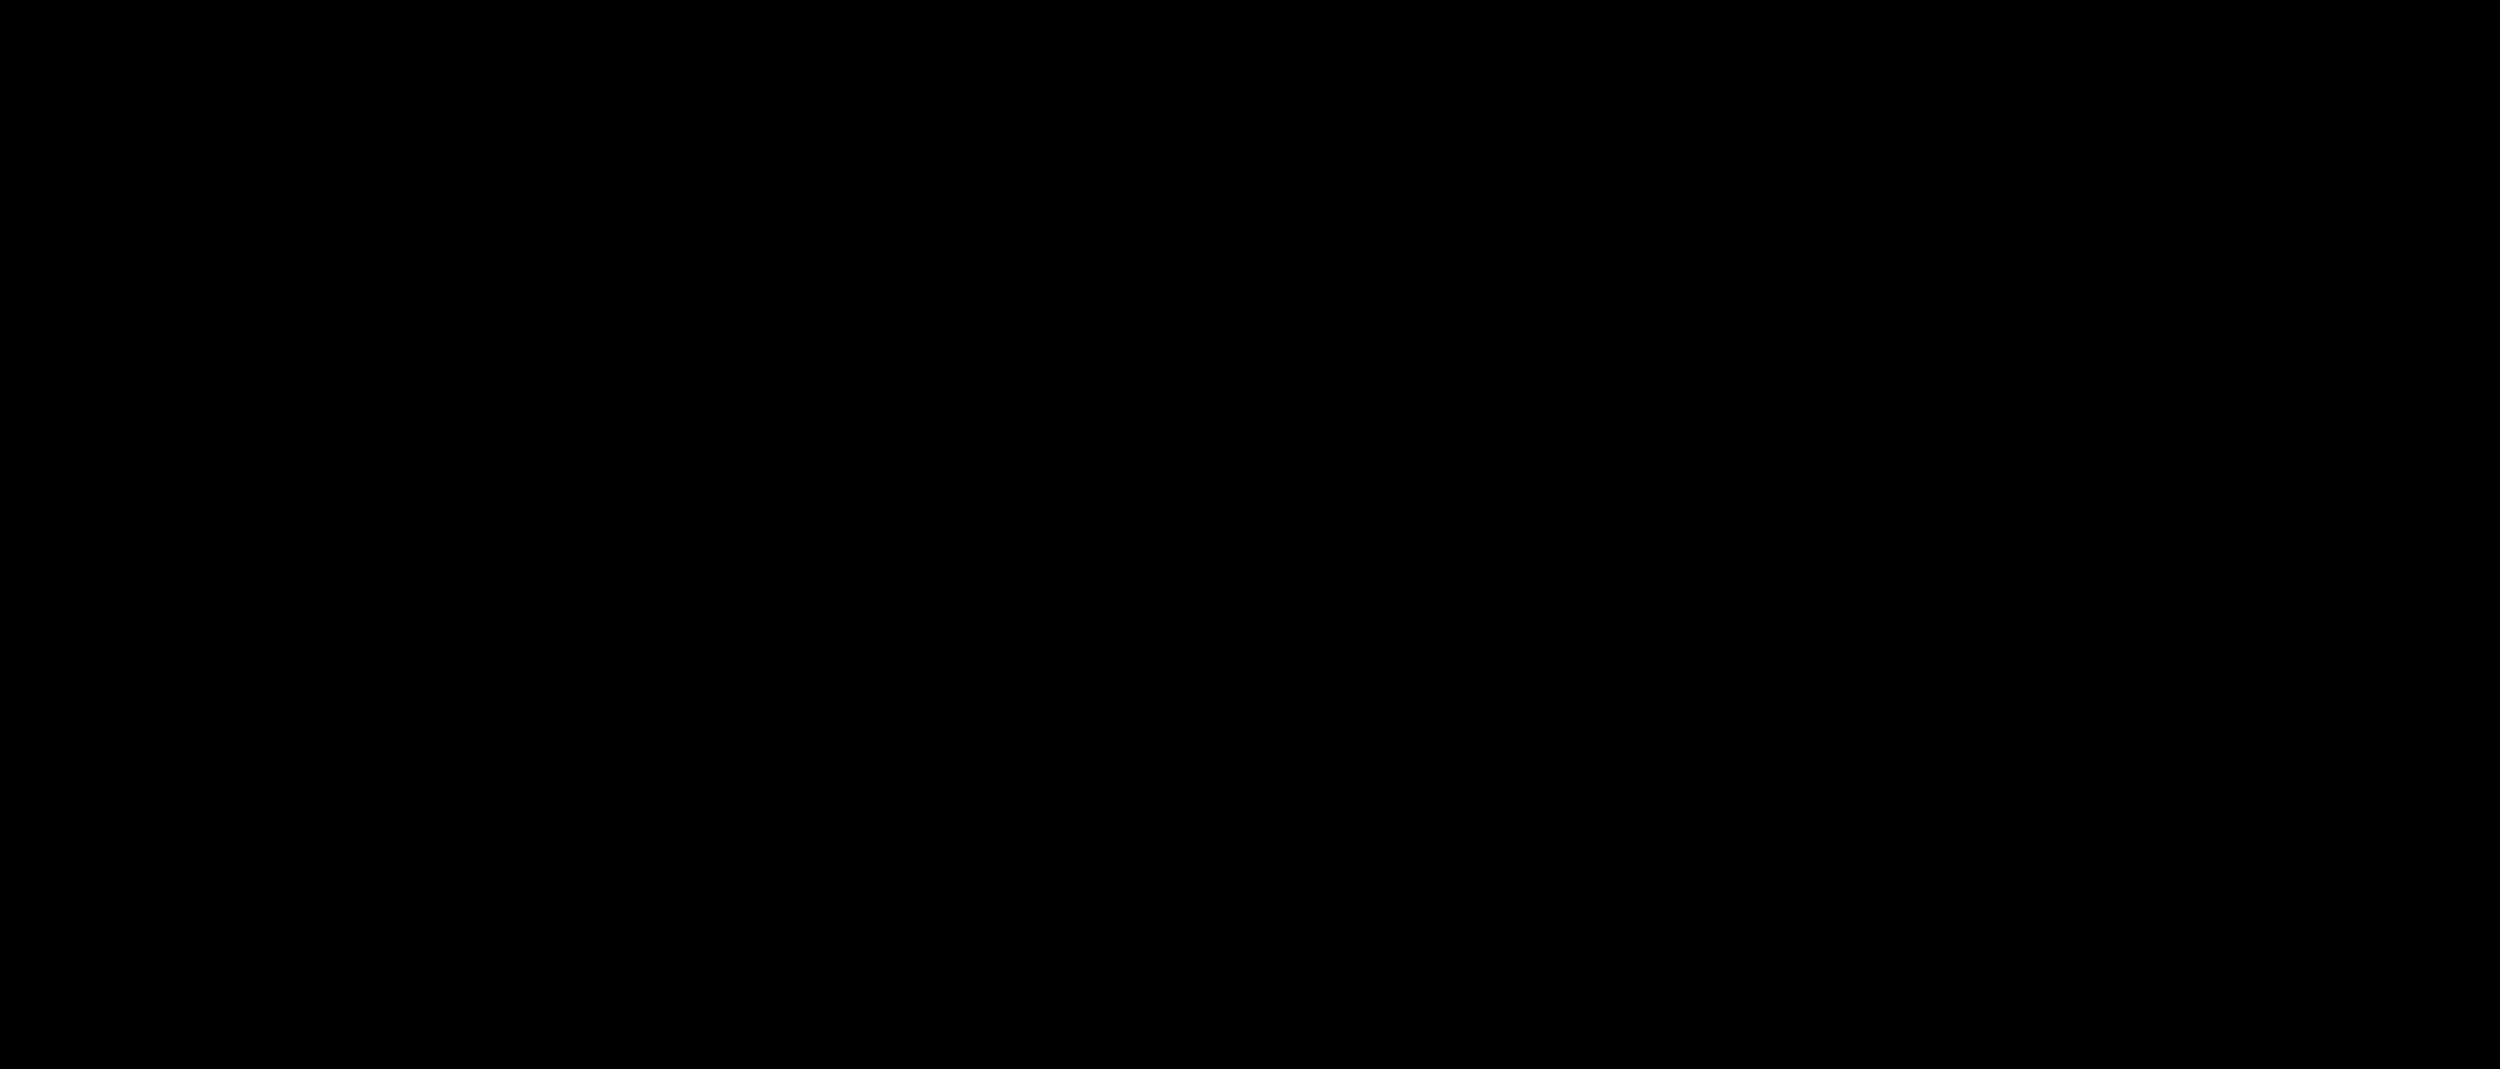 Vimcor track specifications diagram